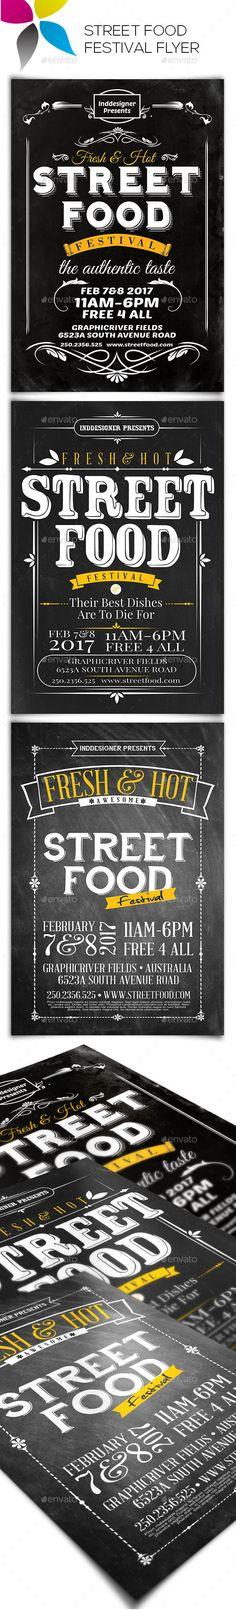 Street Food Festival Flyer — Photoshop PSD #street food festival flyer #street • Available here → https://graphicriver.net/item/street-food-festival-flyer/14861377?ref=pxcr